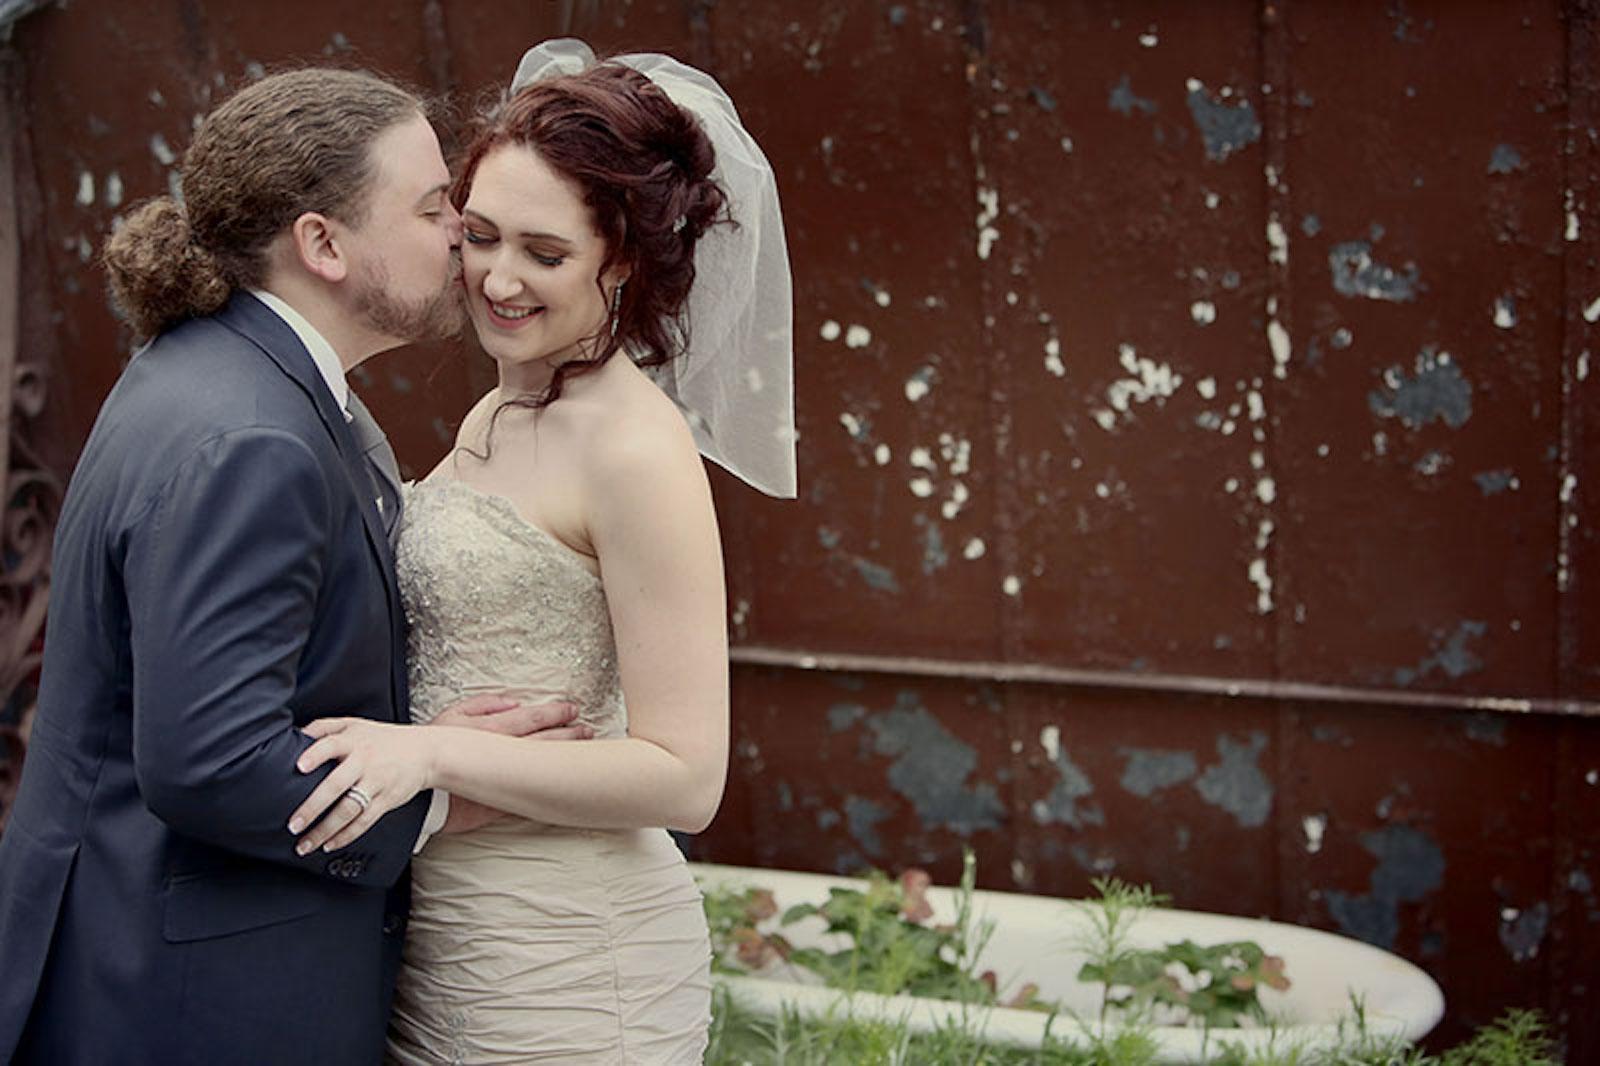 Alternative Wedding Planner for independent, feminist, & LGBTQ+ people